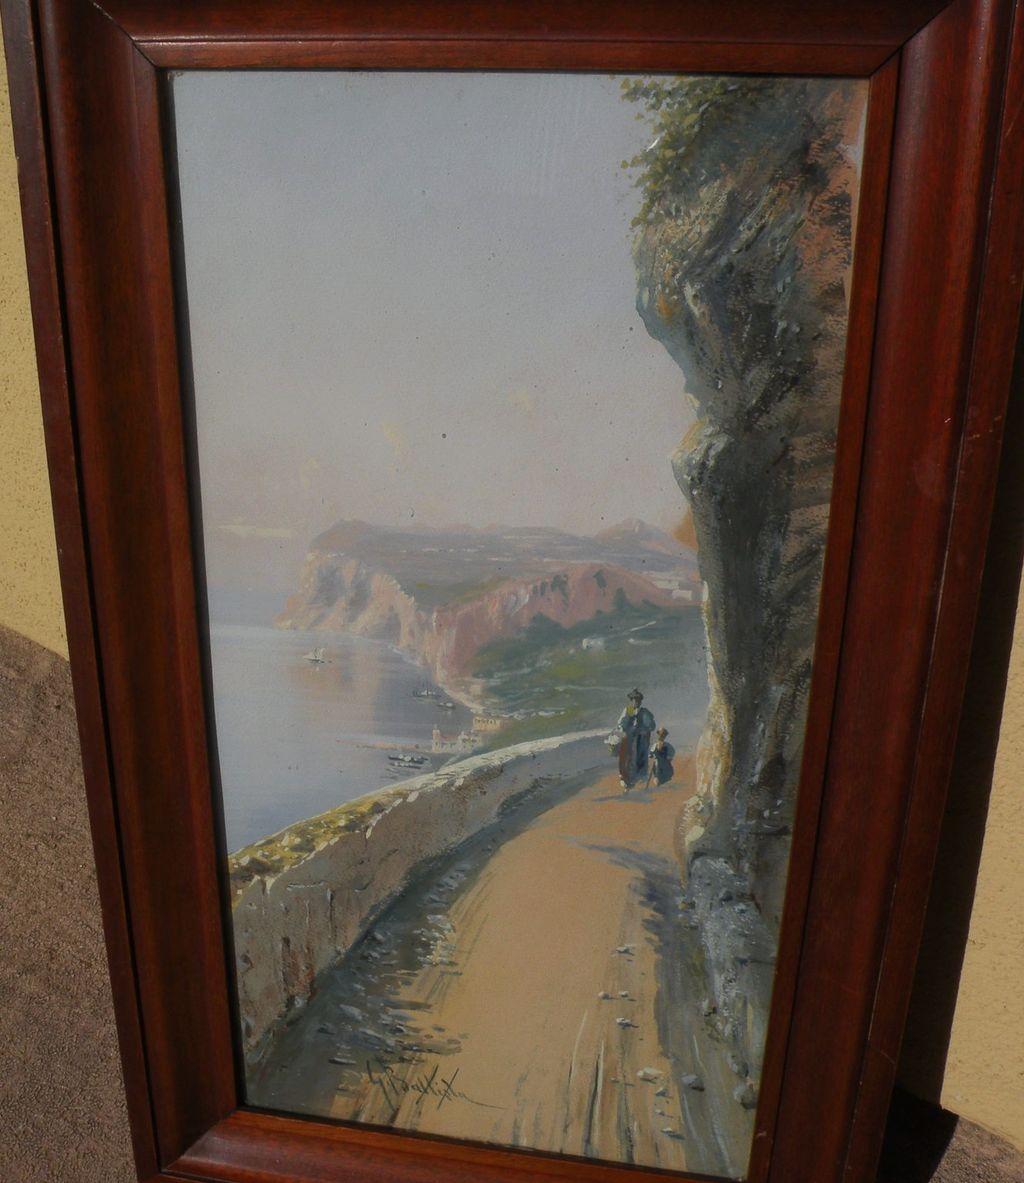 GIOVANNI BATTISTA (1858-1925) Italian art signed gouache coastal landscape painting with figure